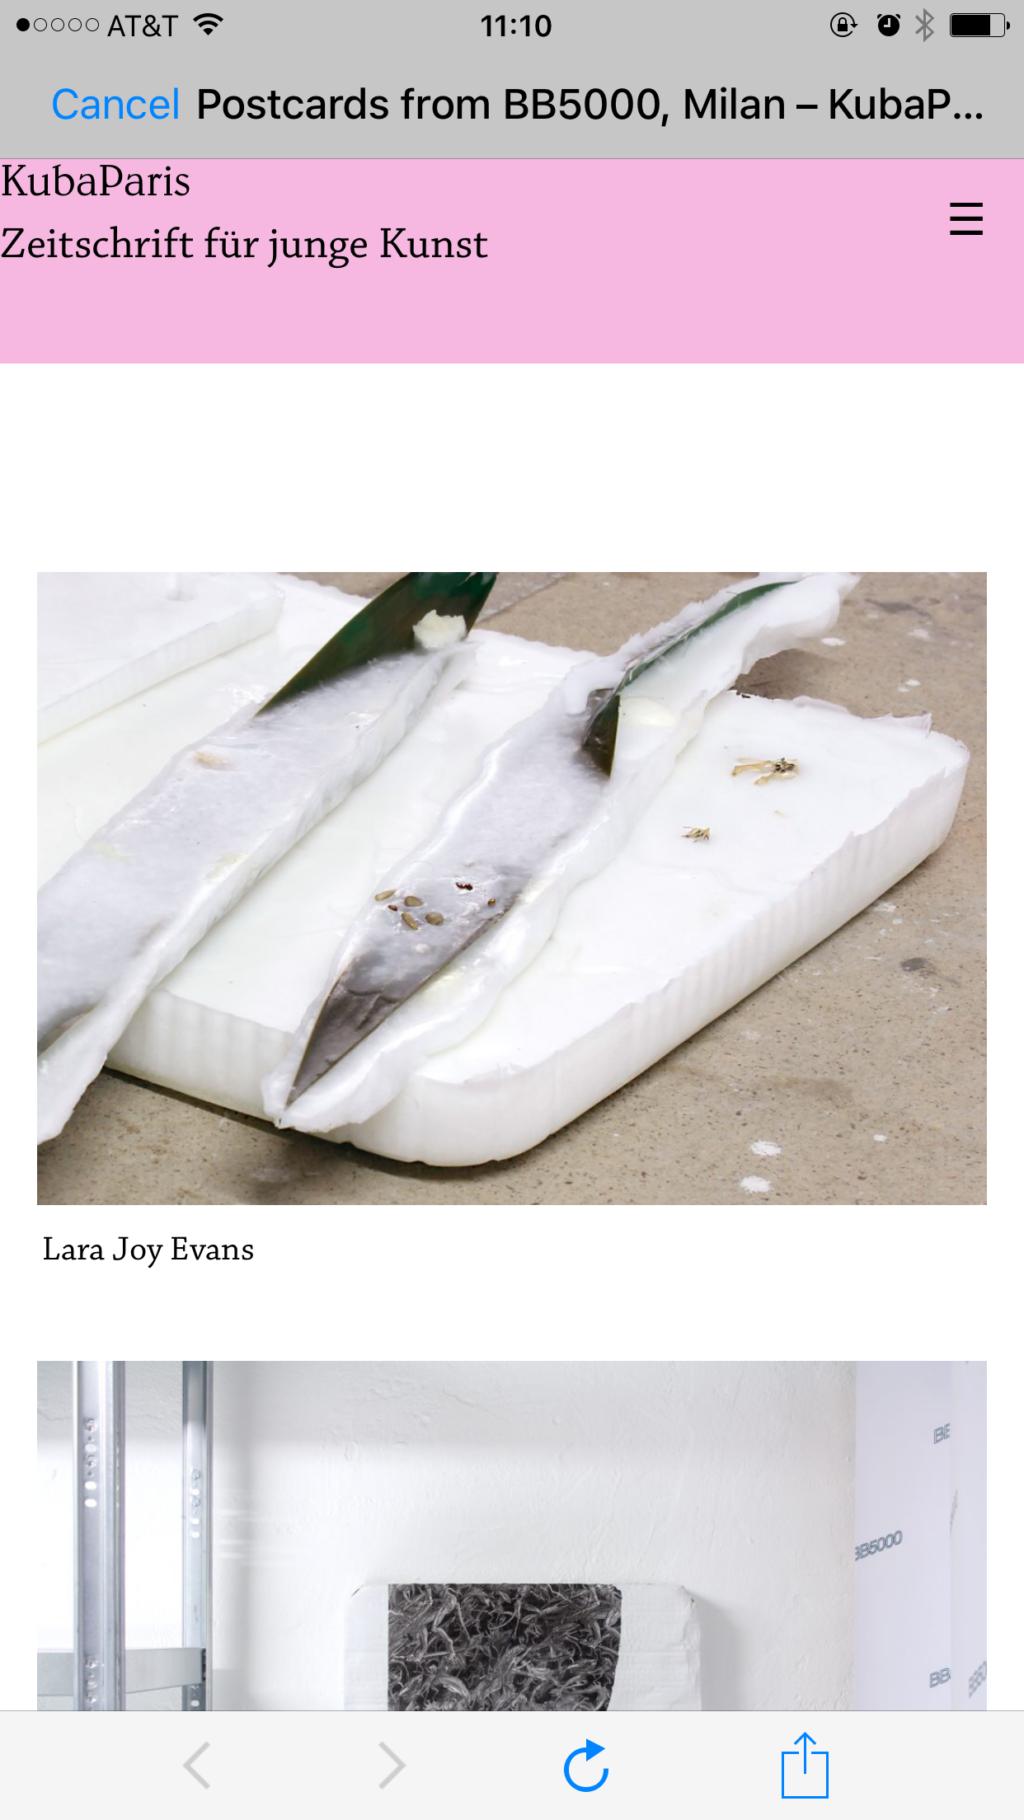 Lara Joy Evans domestic tranquility/401k/bluesky raw